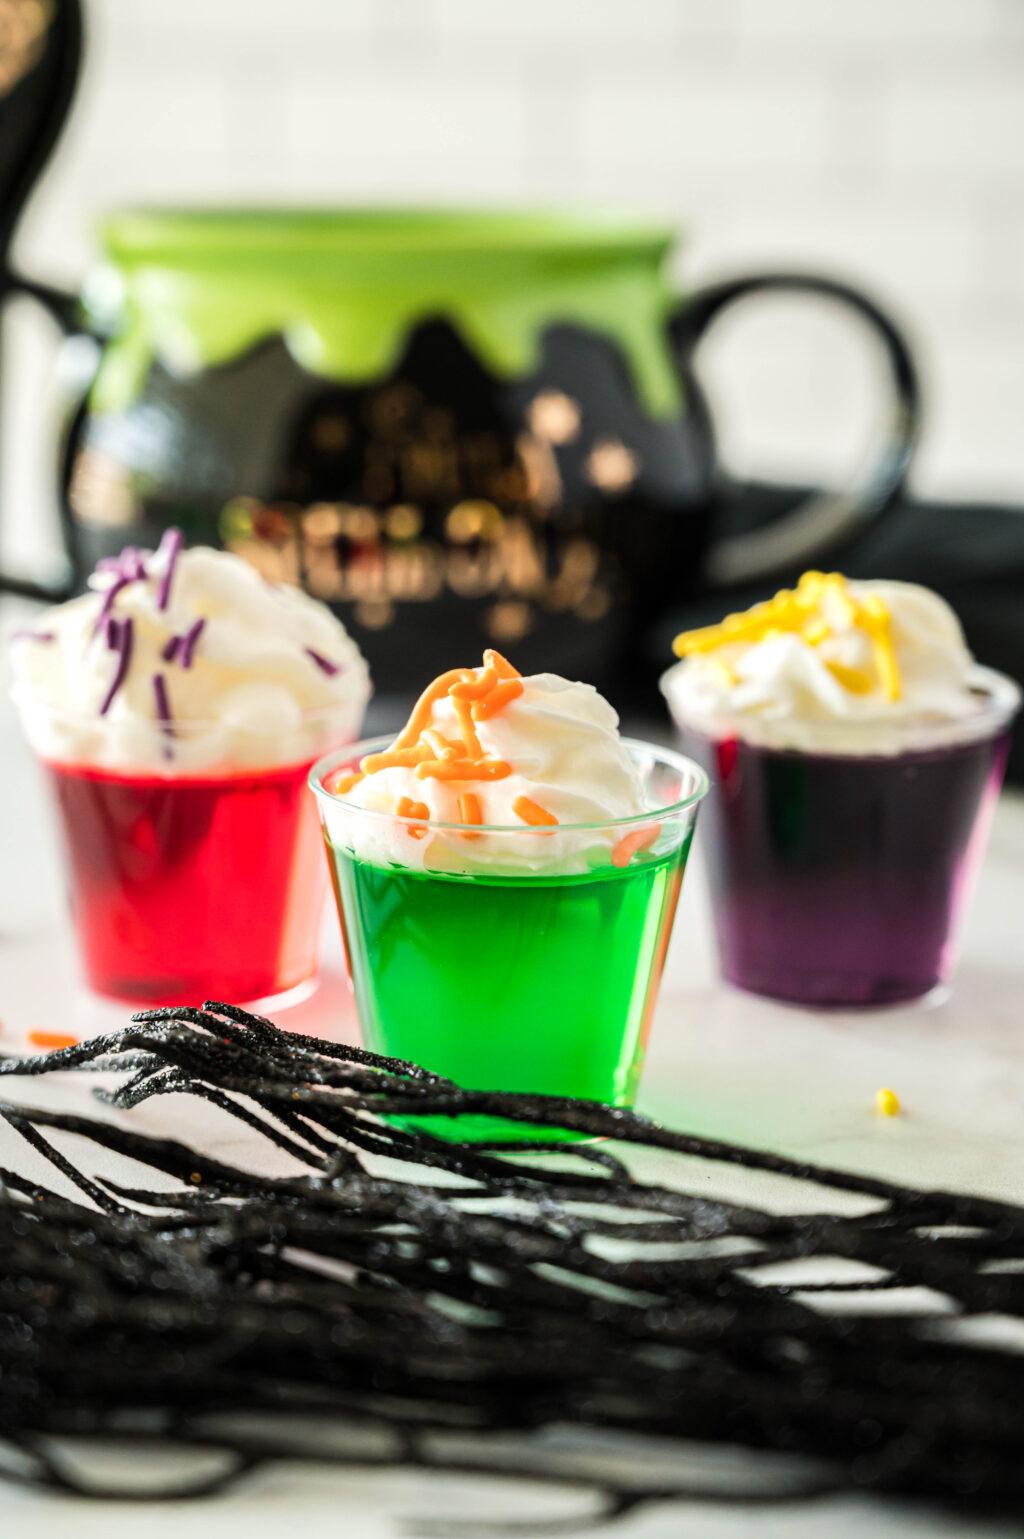 hocus pocus jello shots on a table